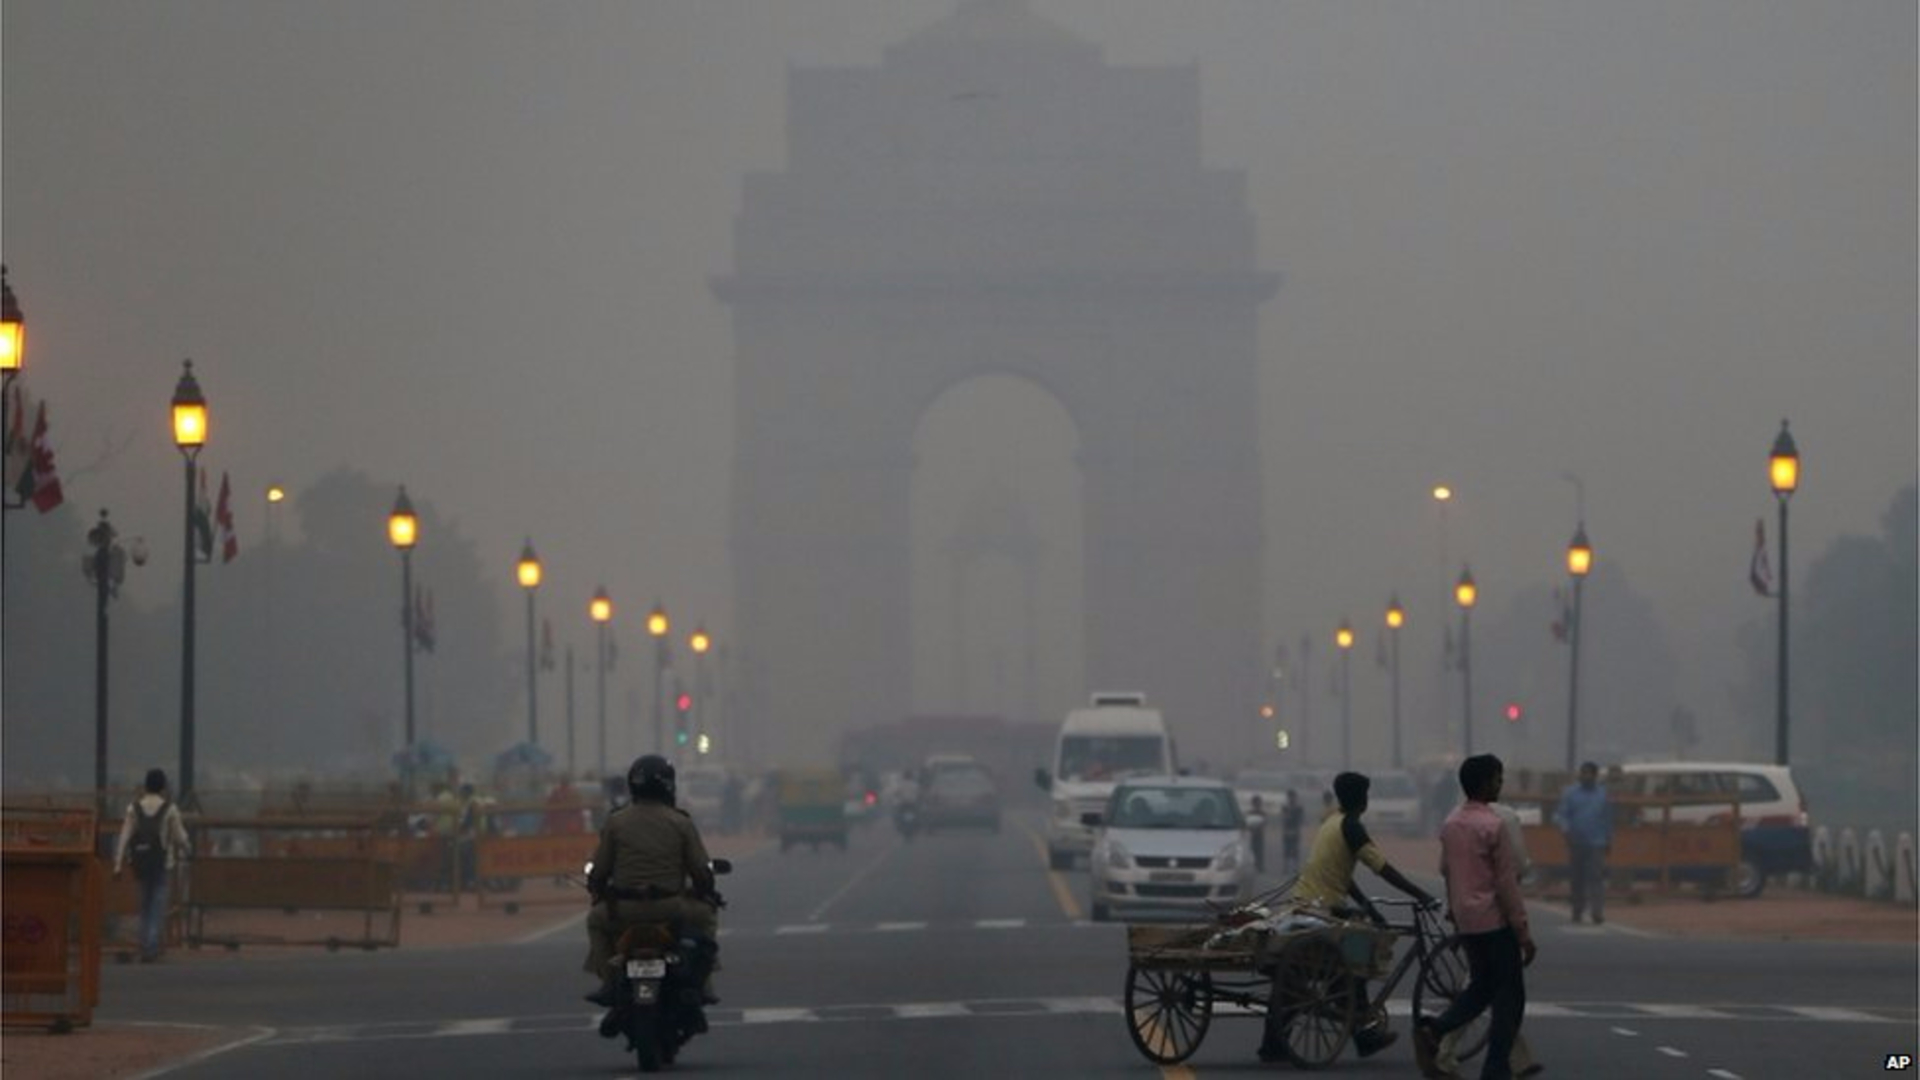 Delhi Pollution Level: Hypocrisy image